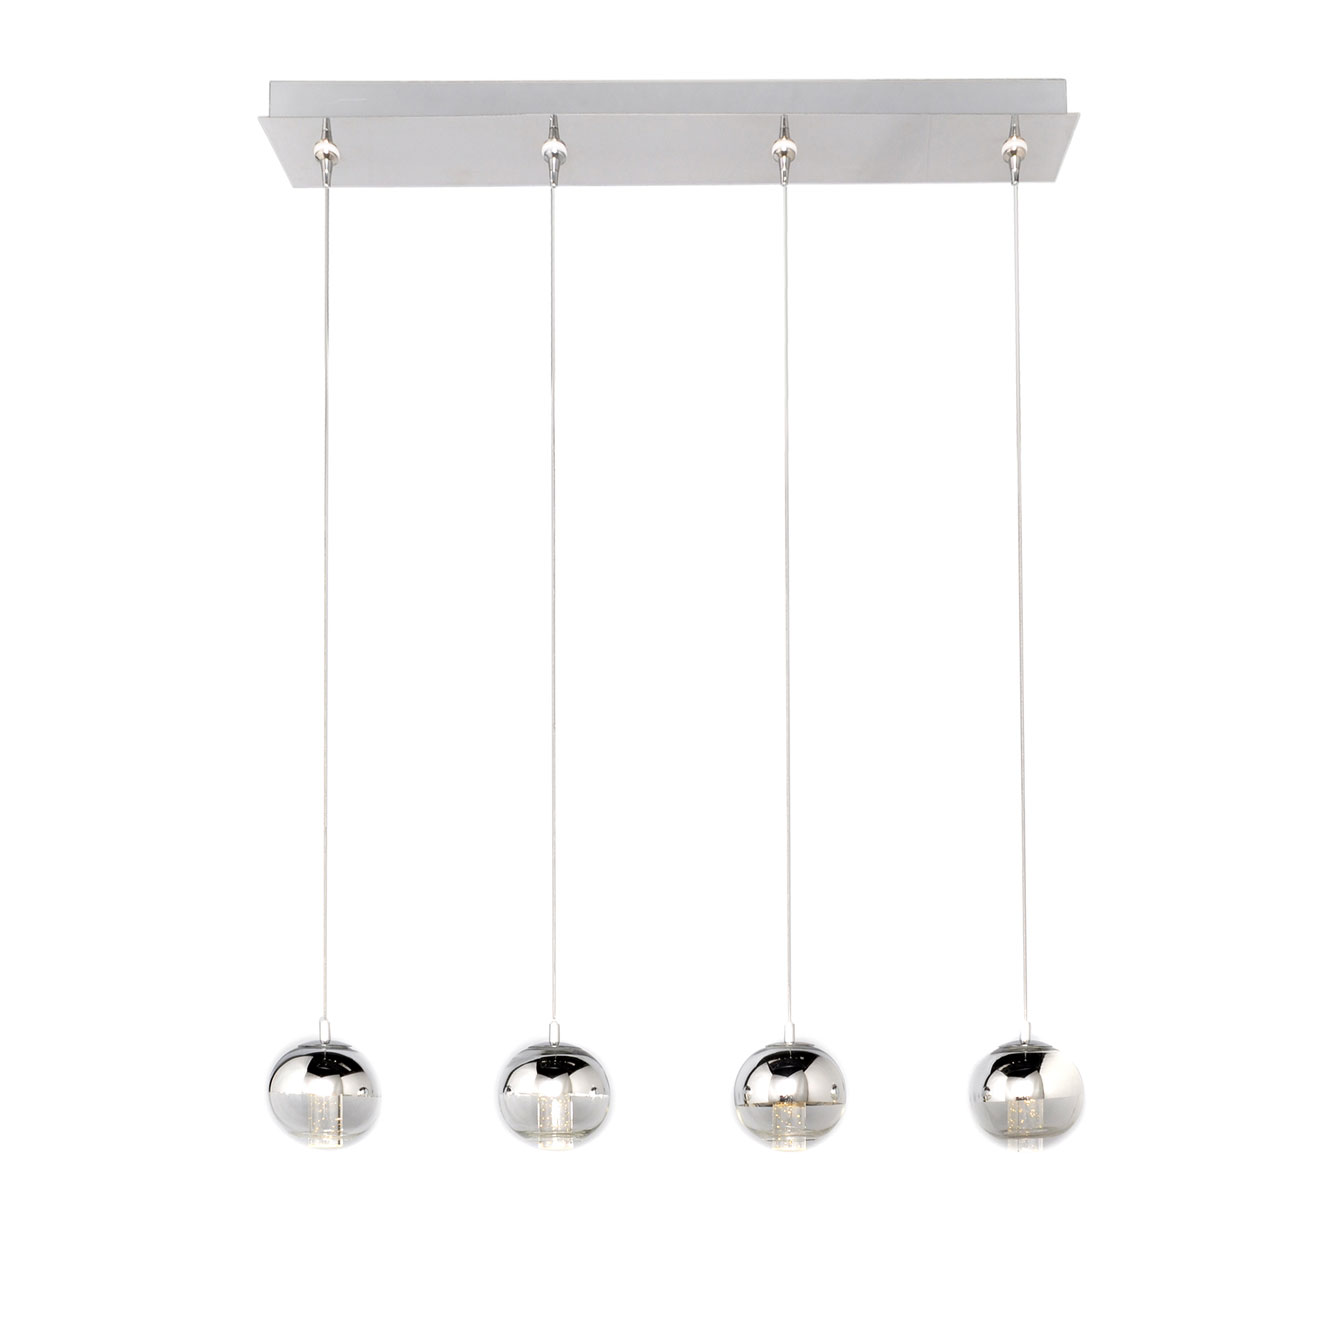 Zing LED Linear Multi Light Pendant Download Image ...